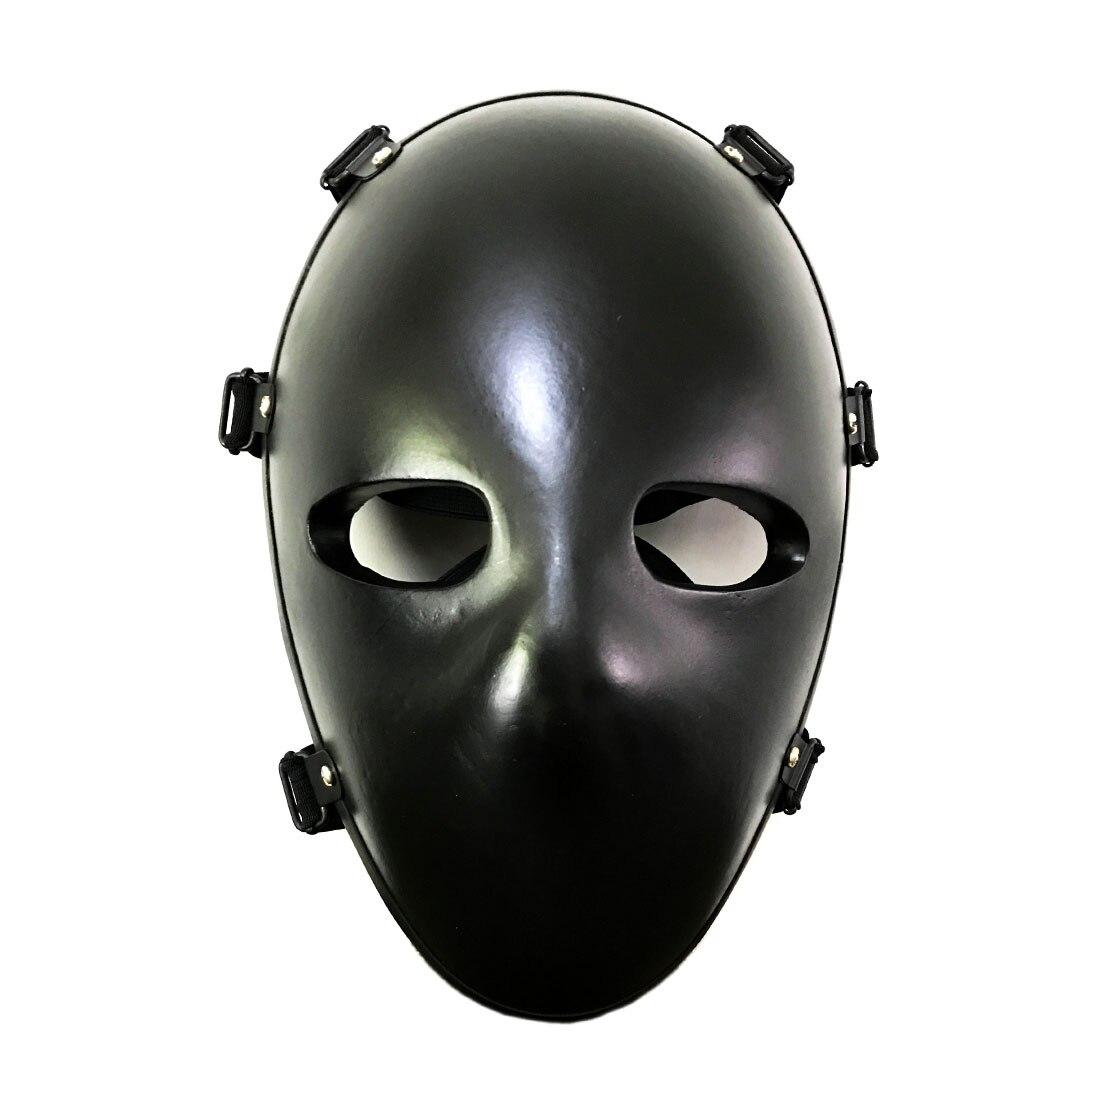 IIIA Level Tactical Face Cover Full Protective Mask - Black